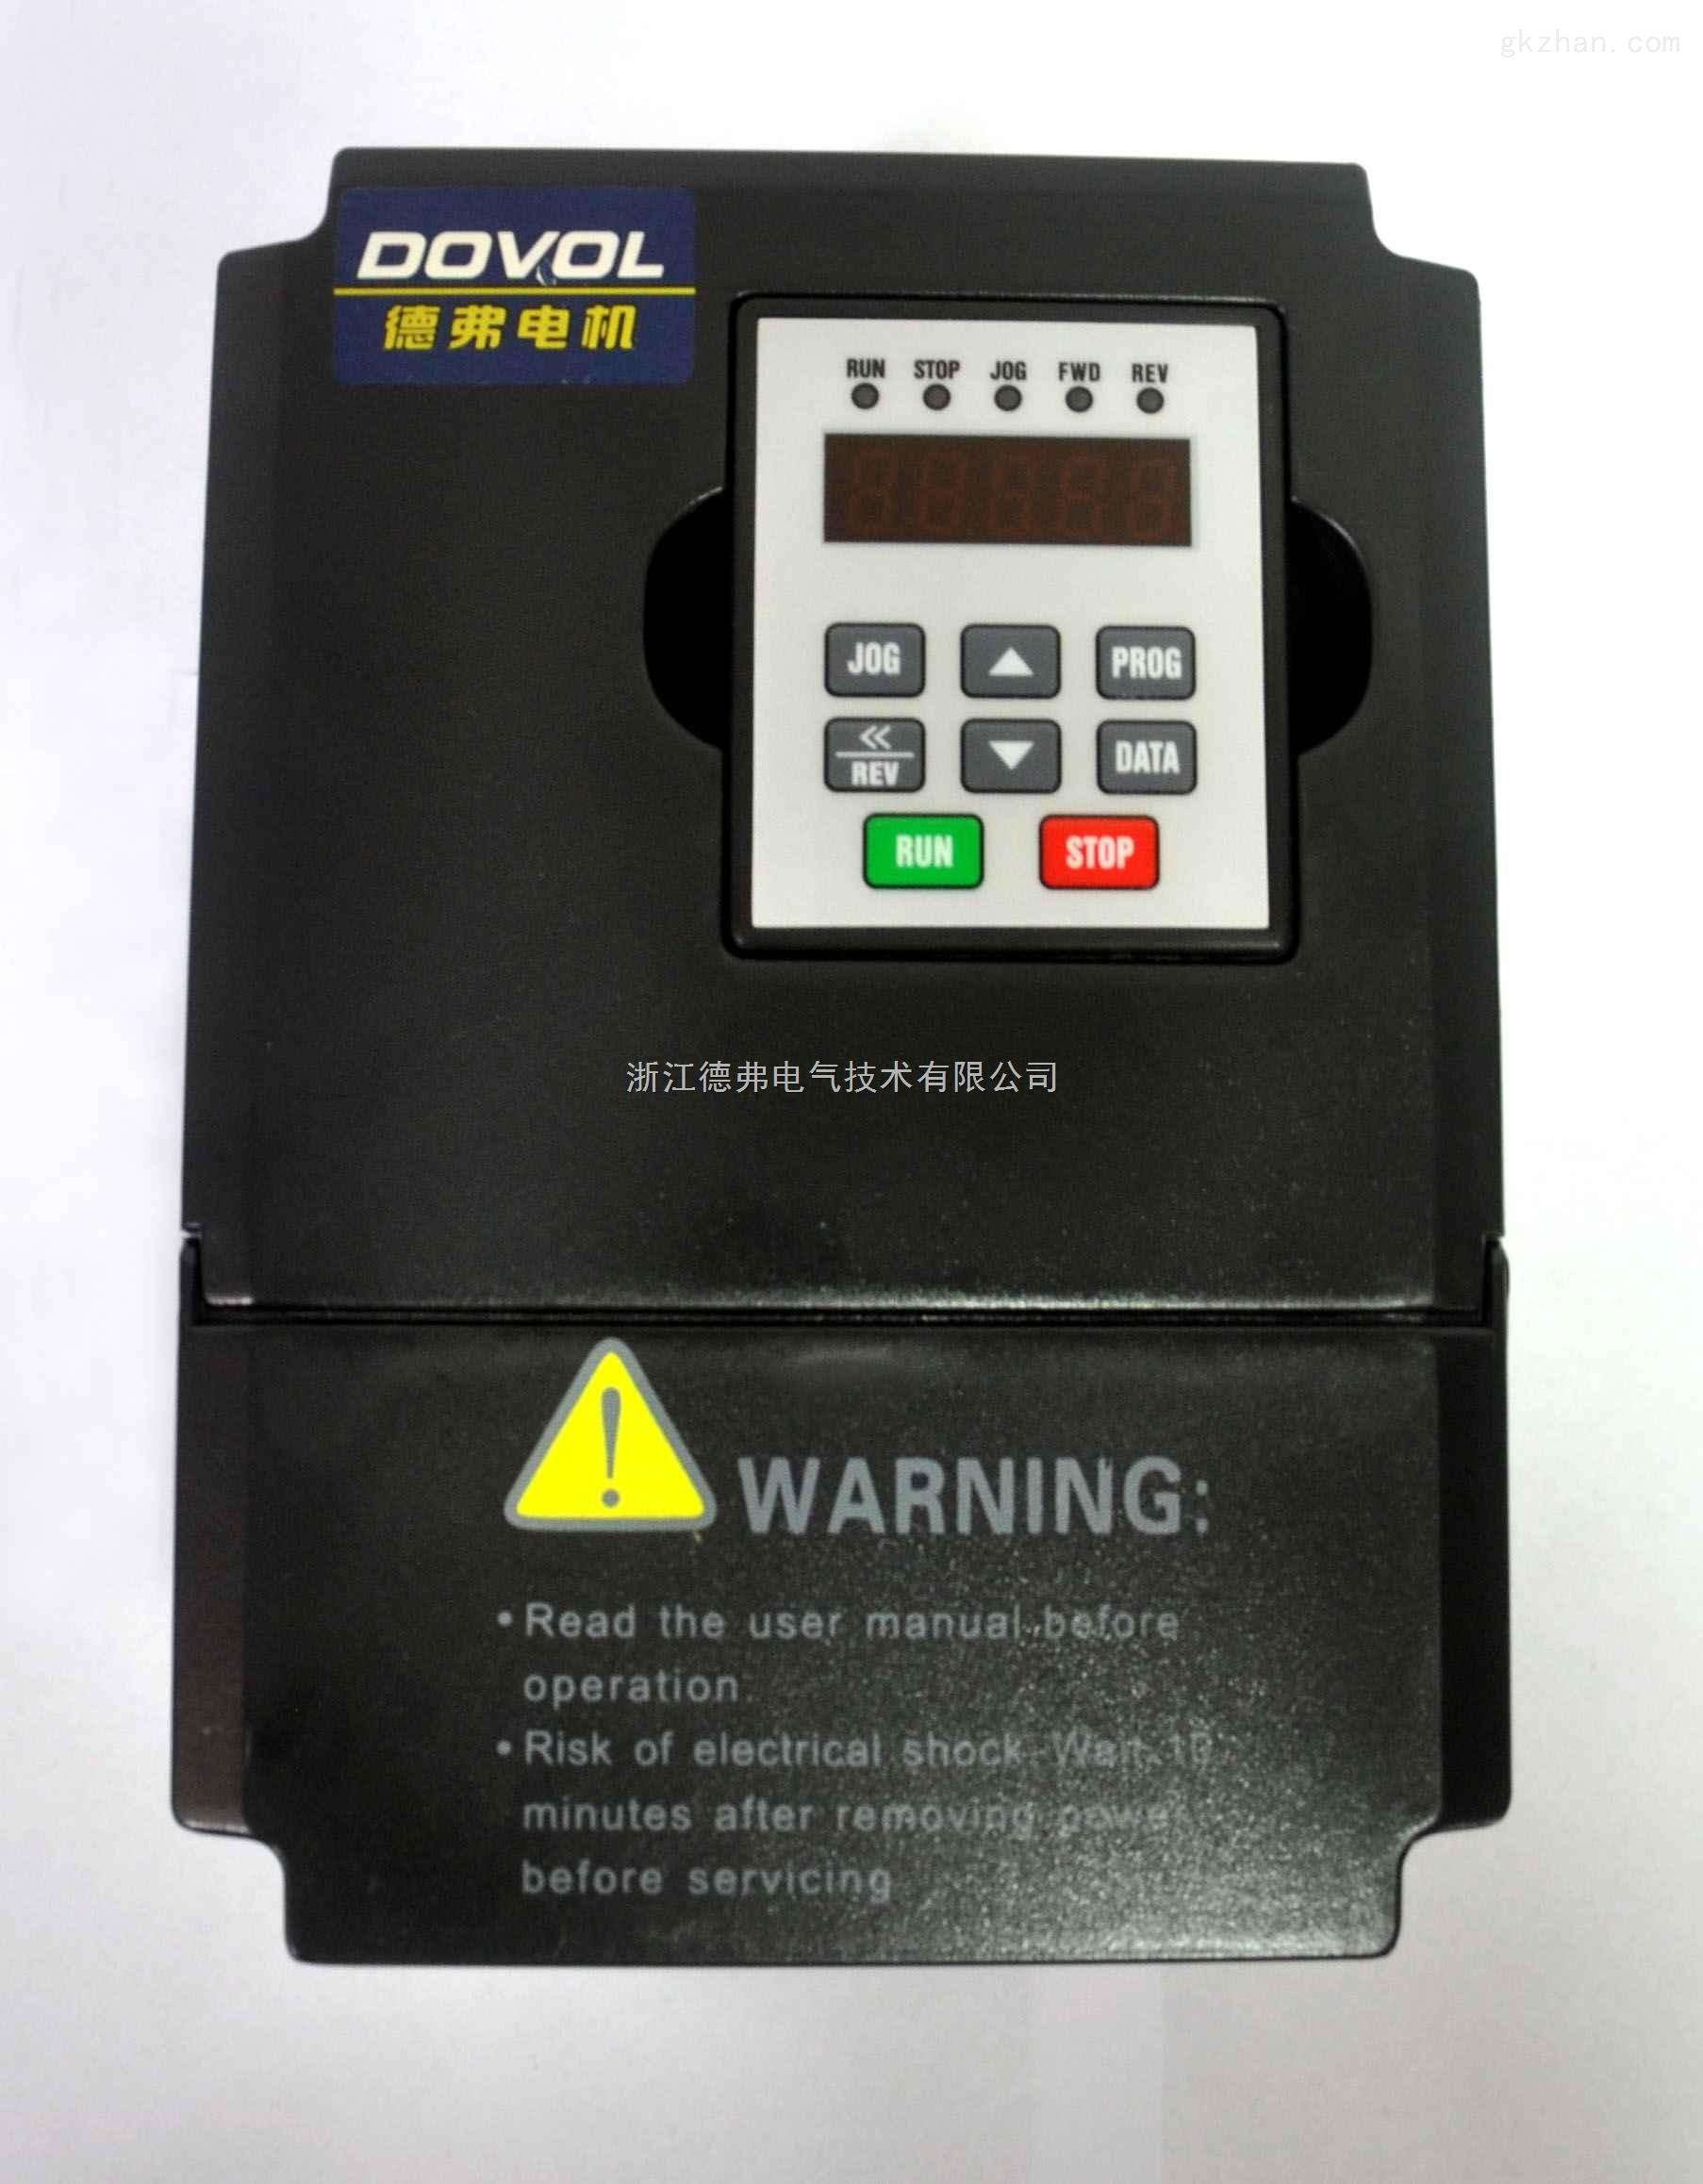 dv610-4022-g-变频器 德弗dv610-4022-g